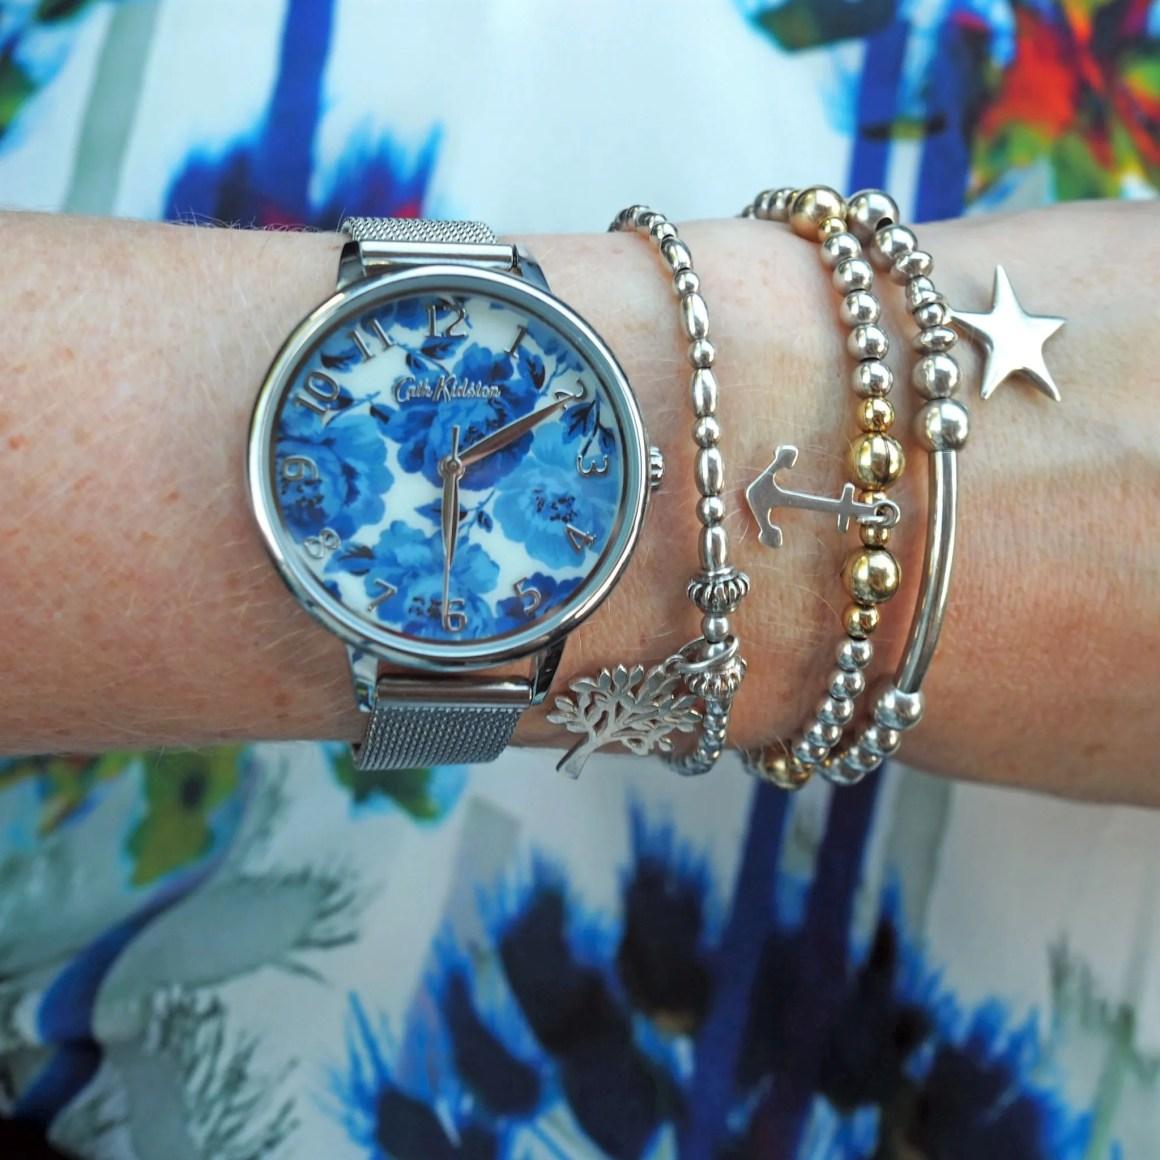 Cath Kidston floral watch bella Jane bracelets